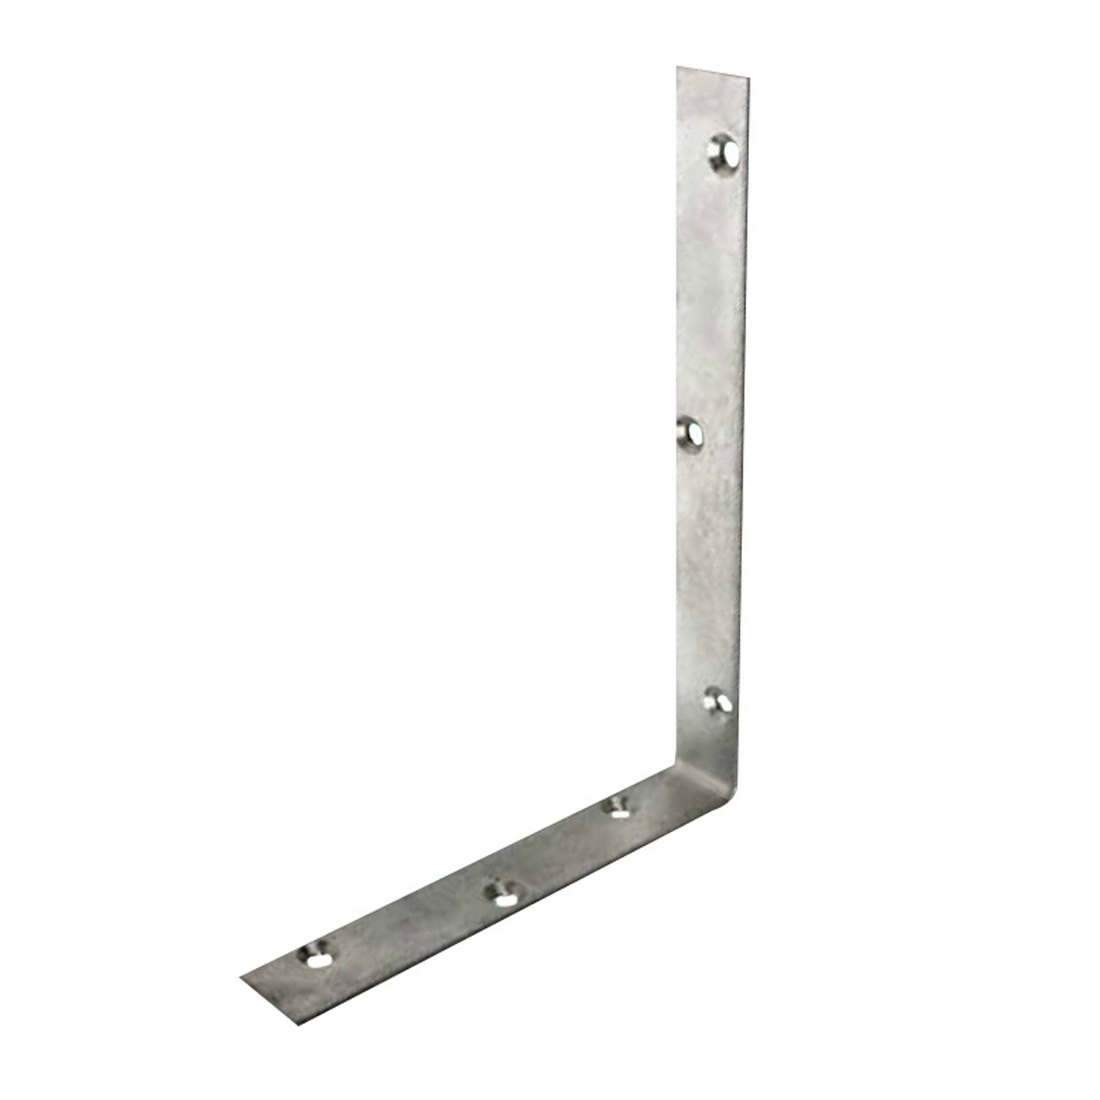 Angle Bracket 100 x 22mm Zinc Plated BANSZ100E022R